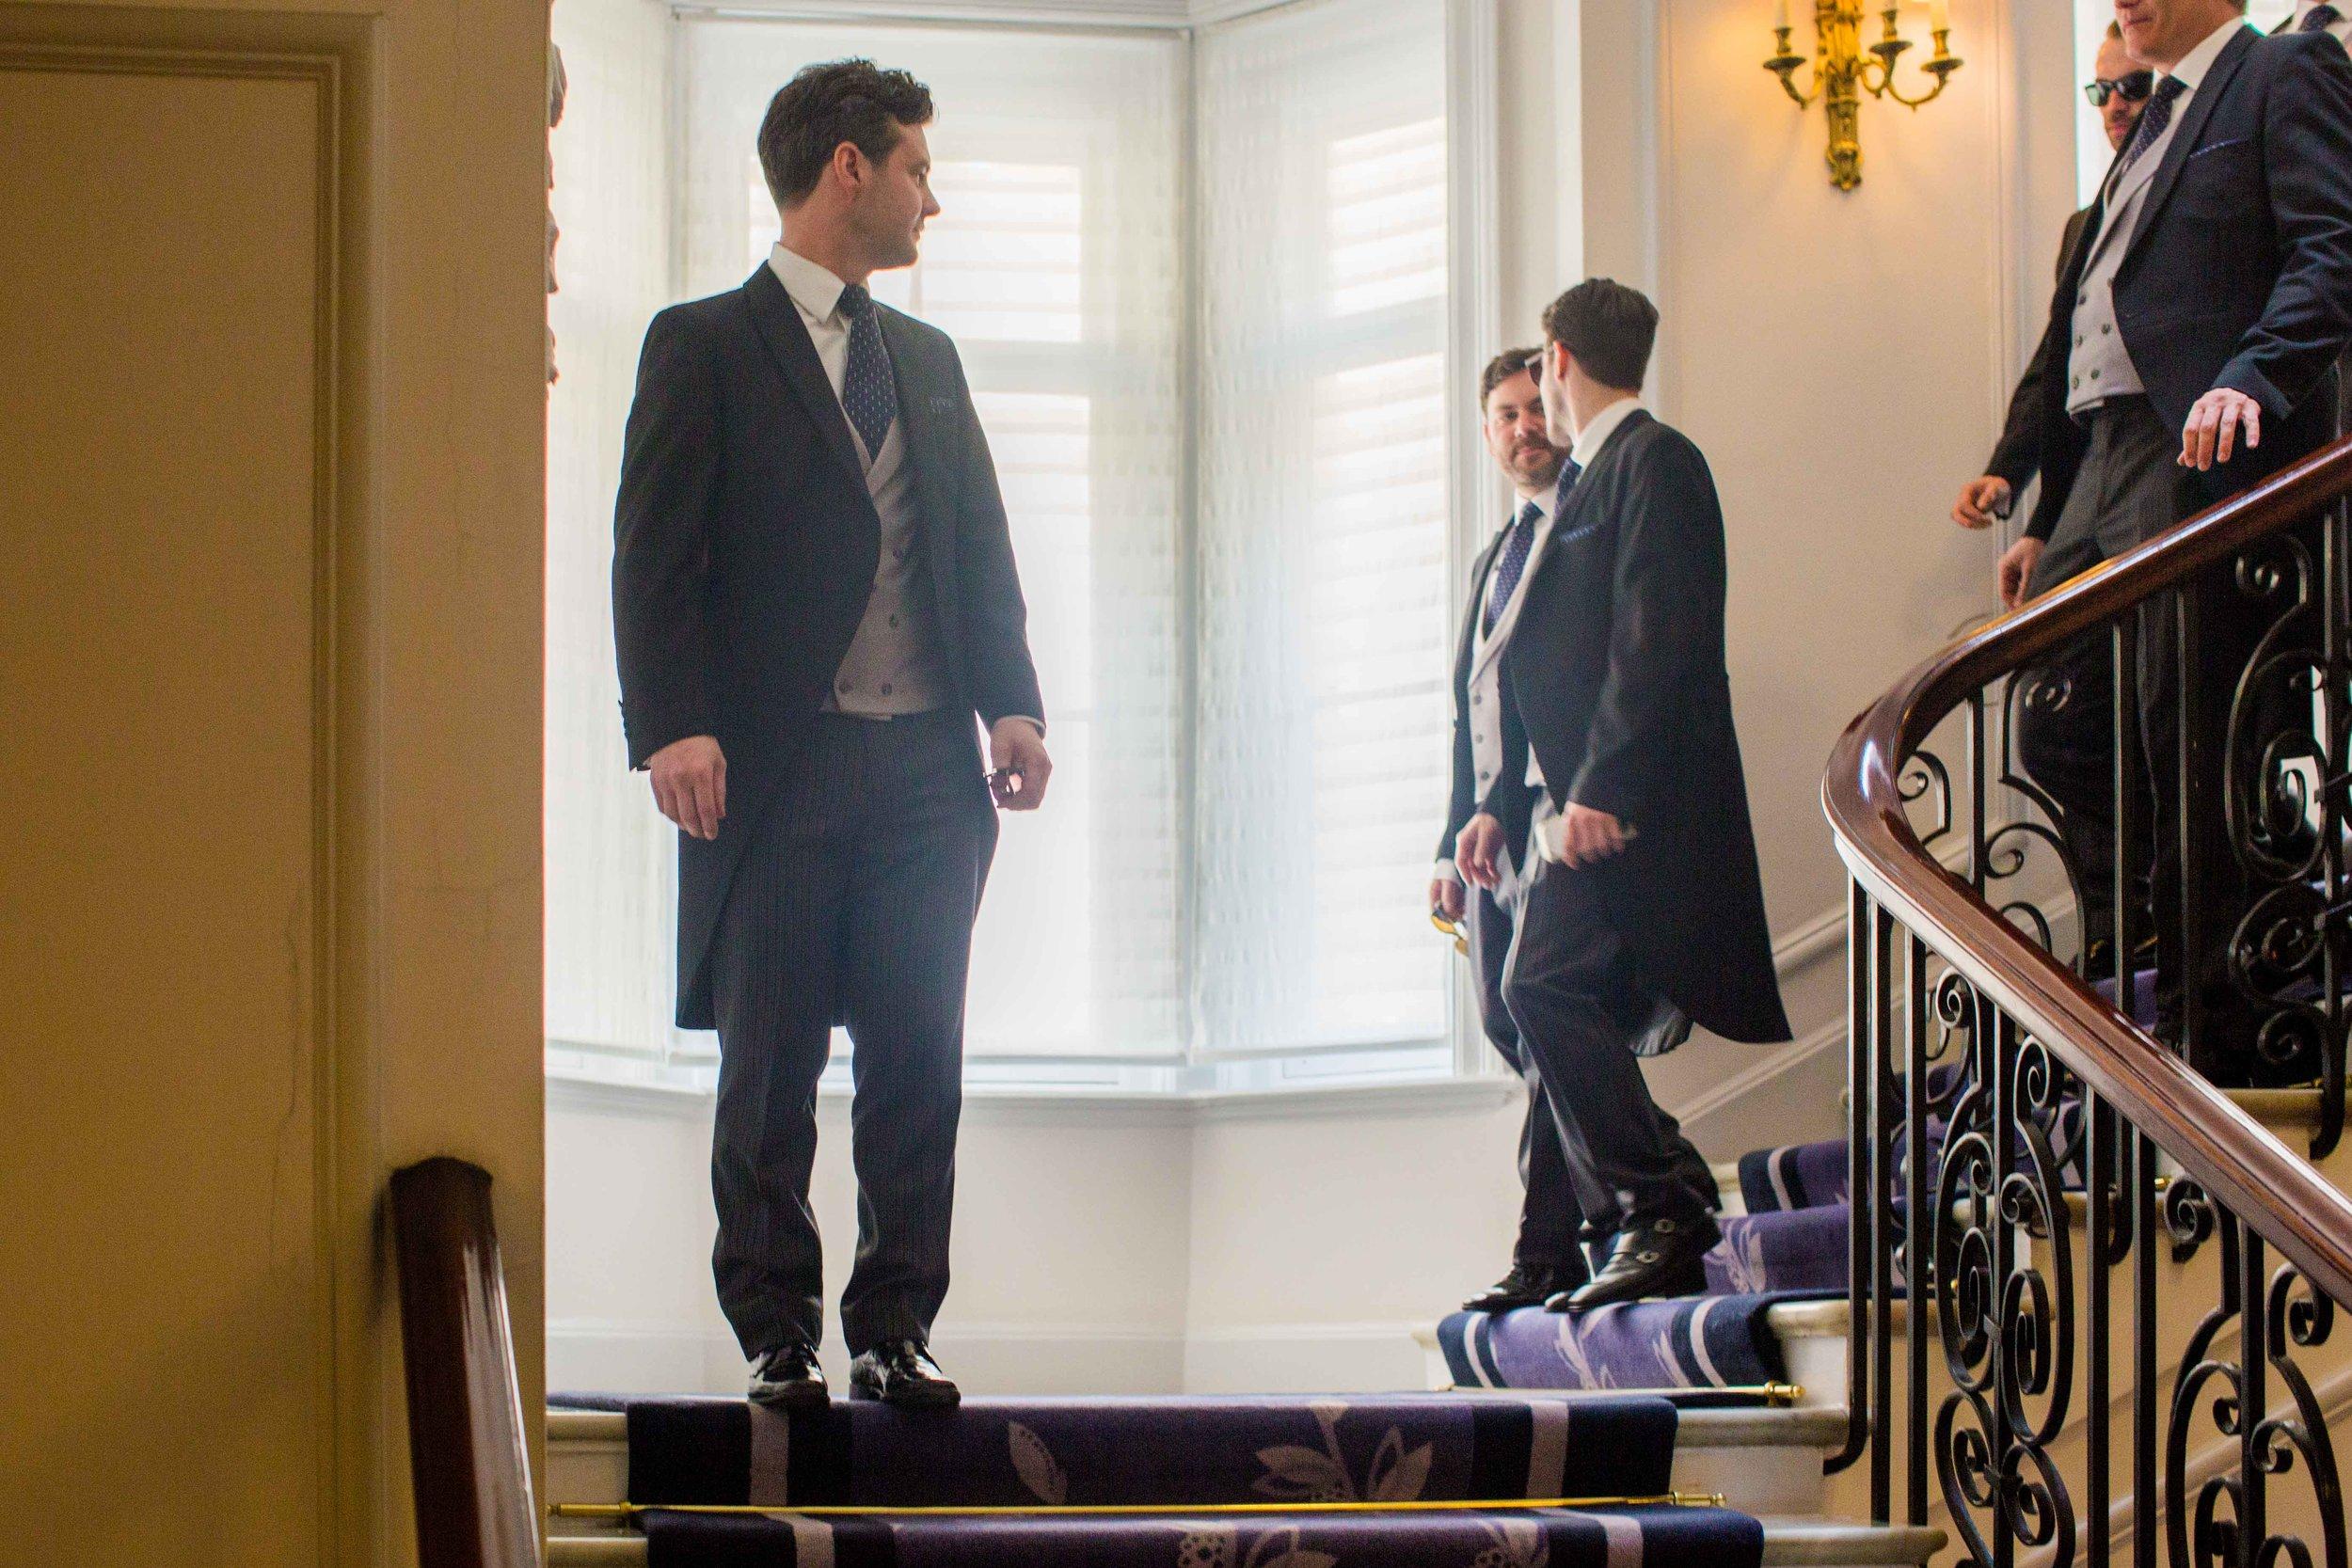 claridges-hotel-wedding-photographer-london-mayfair-natalia-smith-photography-35.jpg